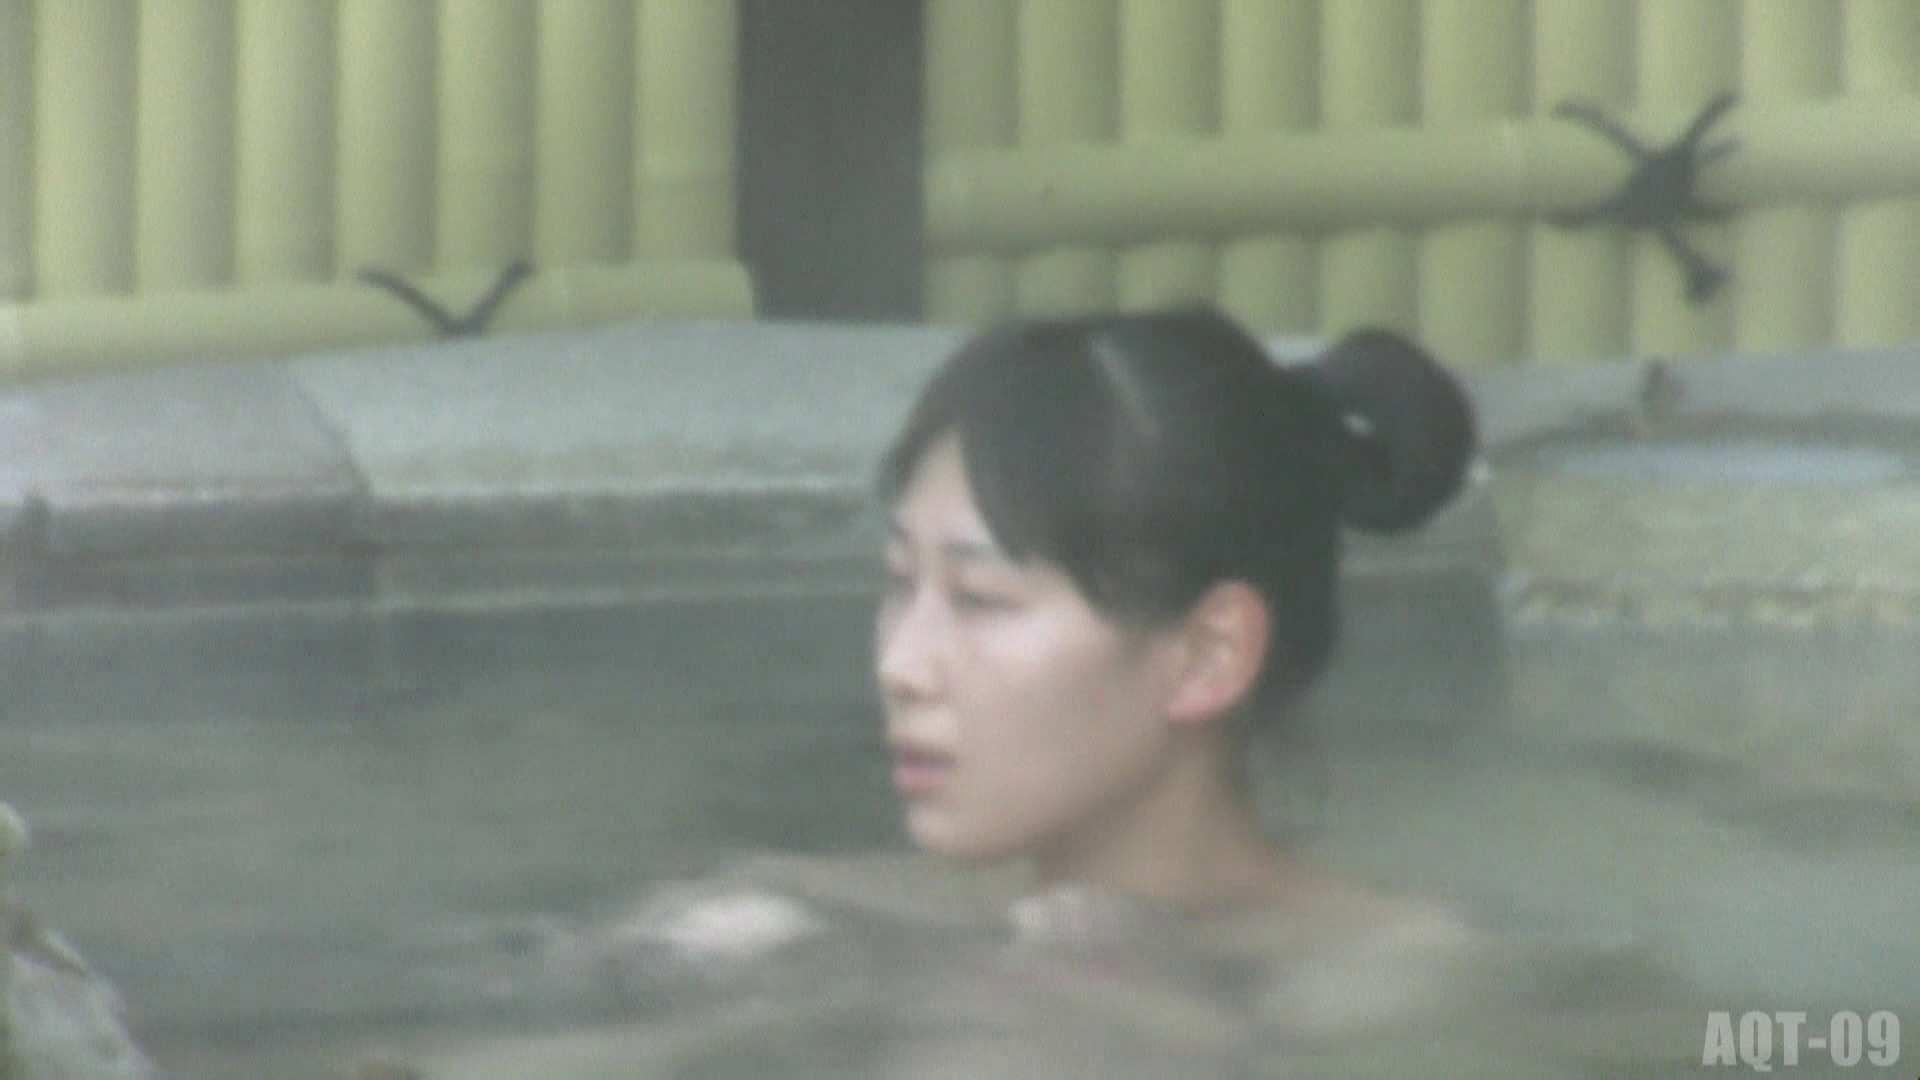 Aquaな露天風呂Vol.785 露天風呂編  110PIX 42